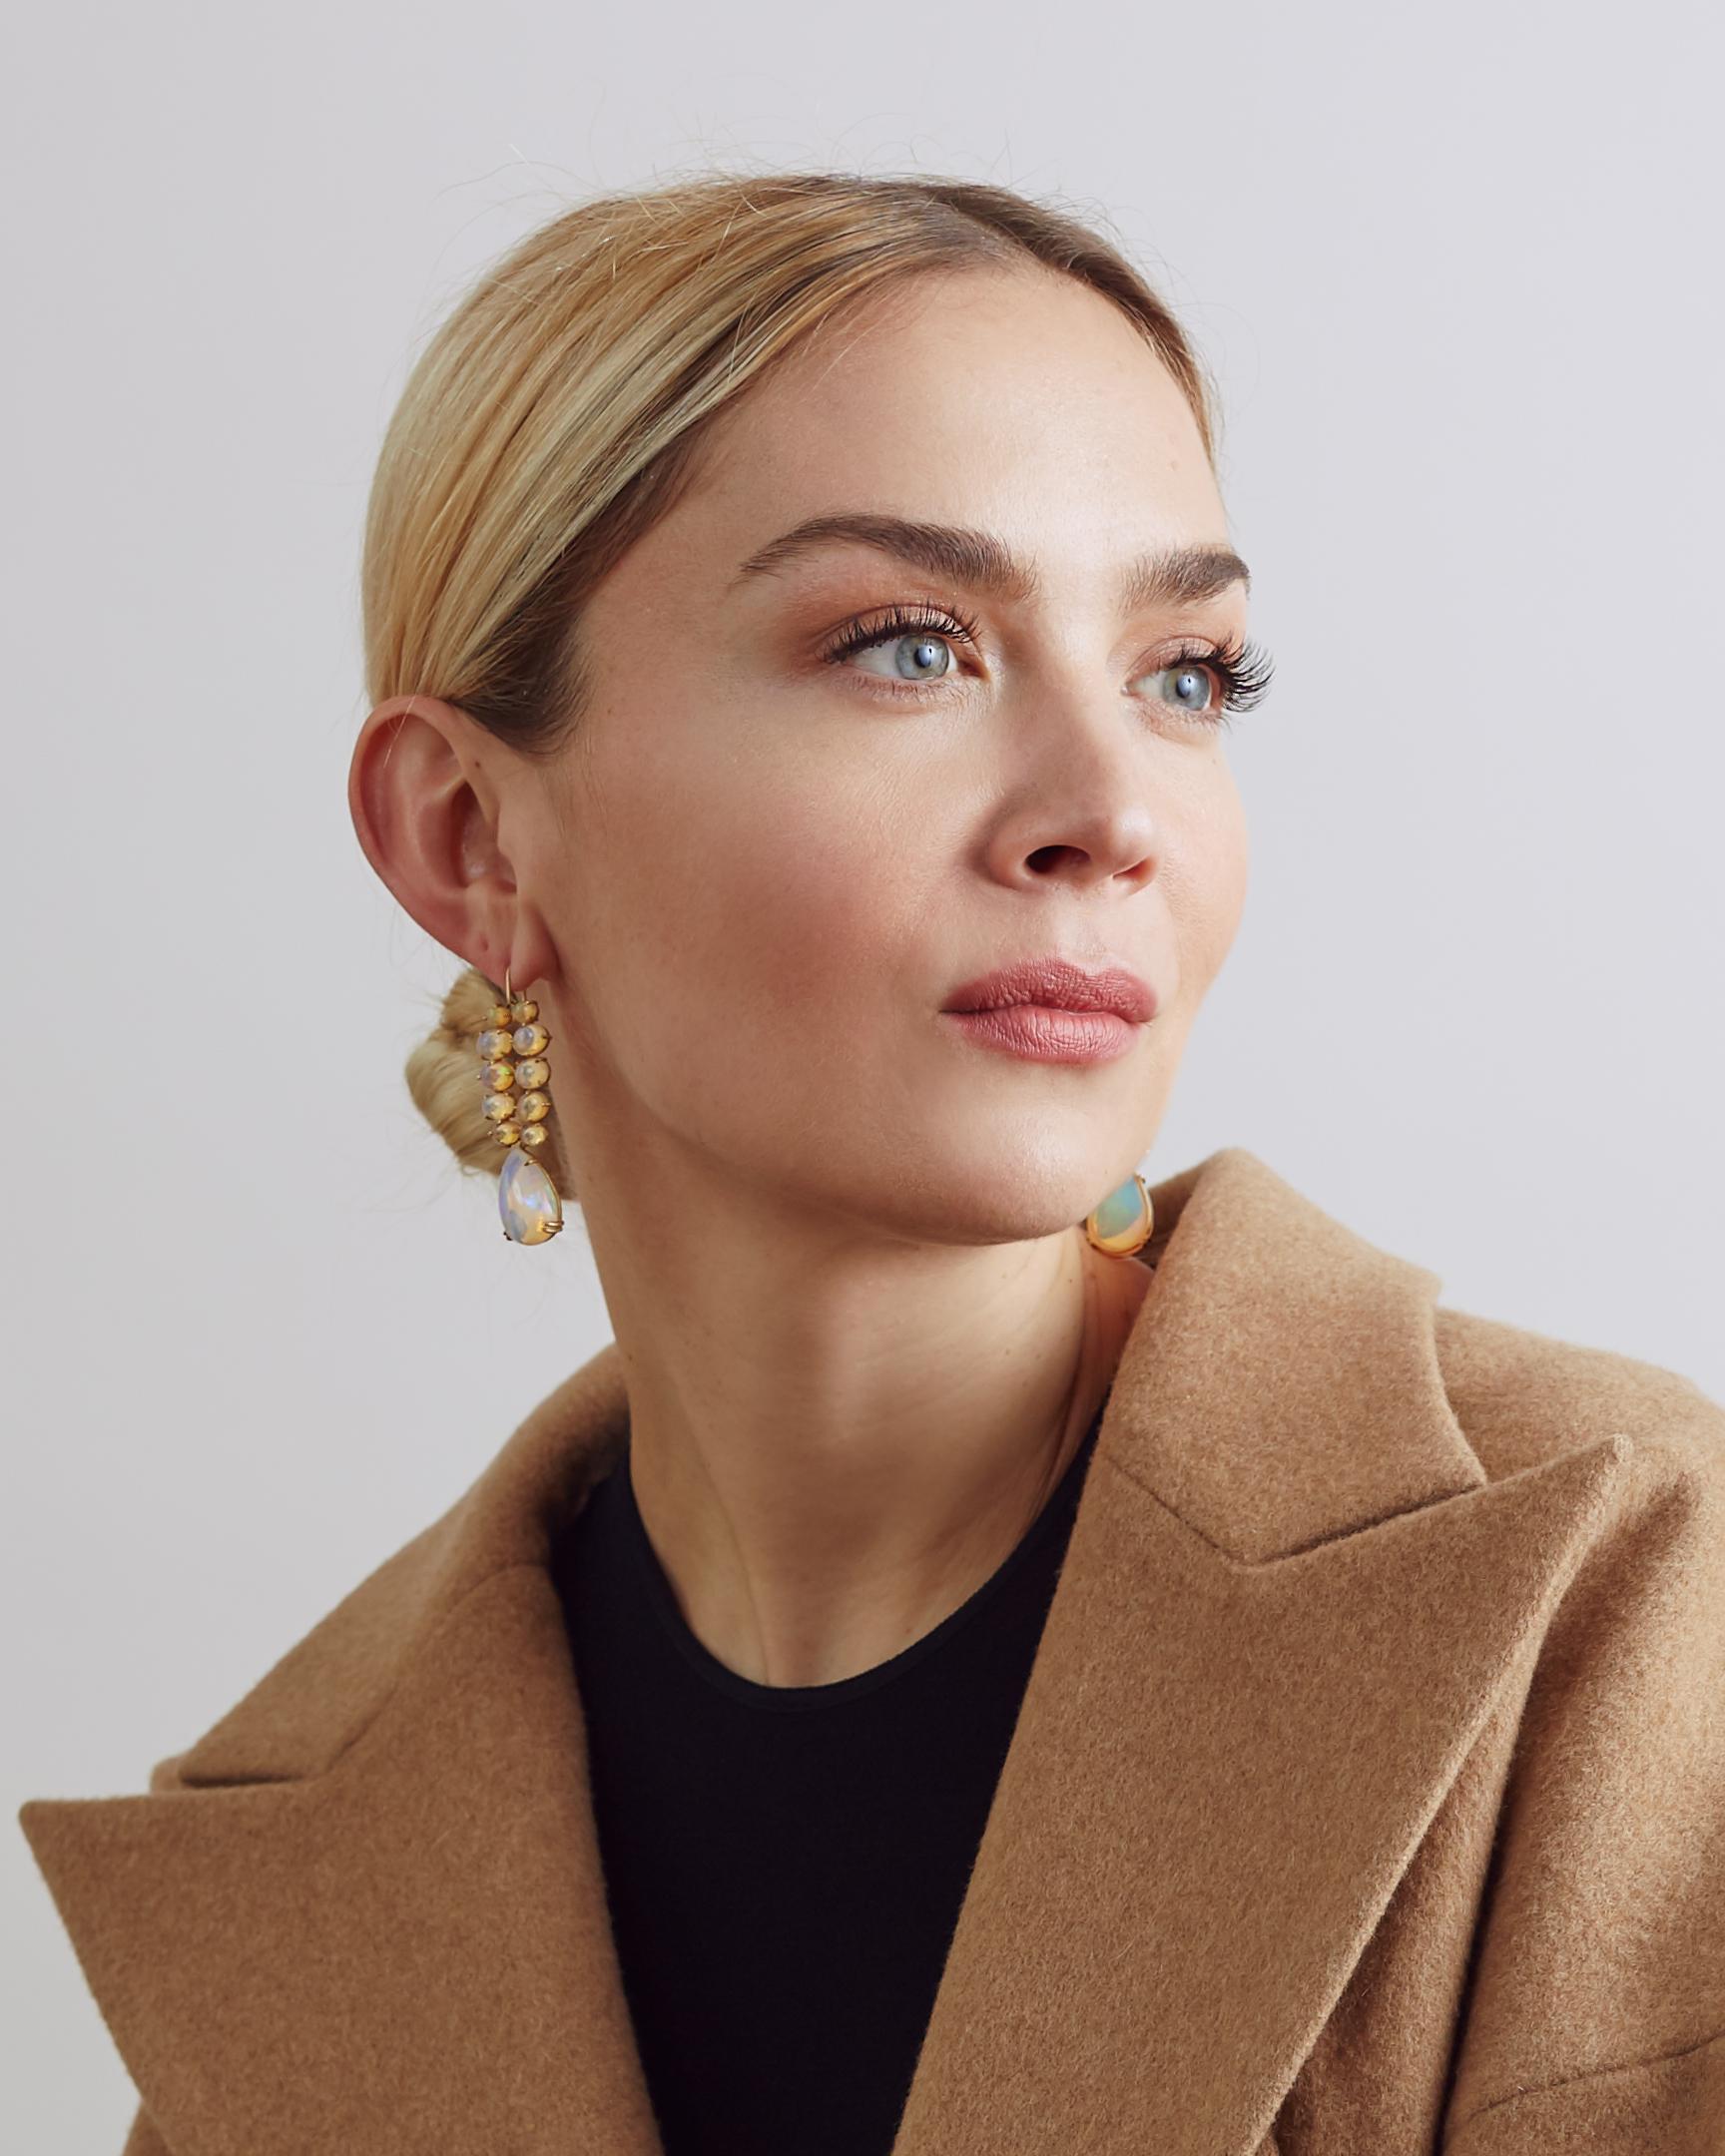 Christina Sharp - 2018.01 - Personal Portrait - 0432.jpg